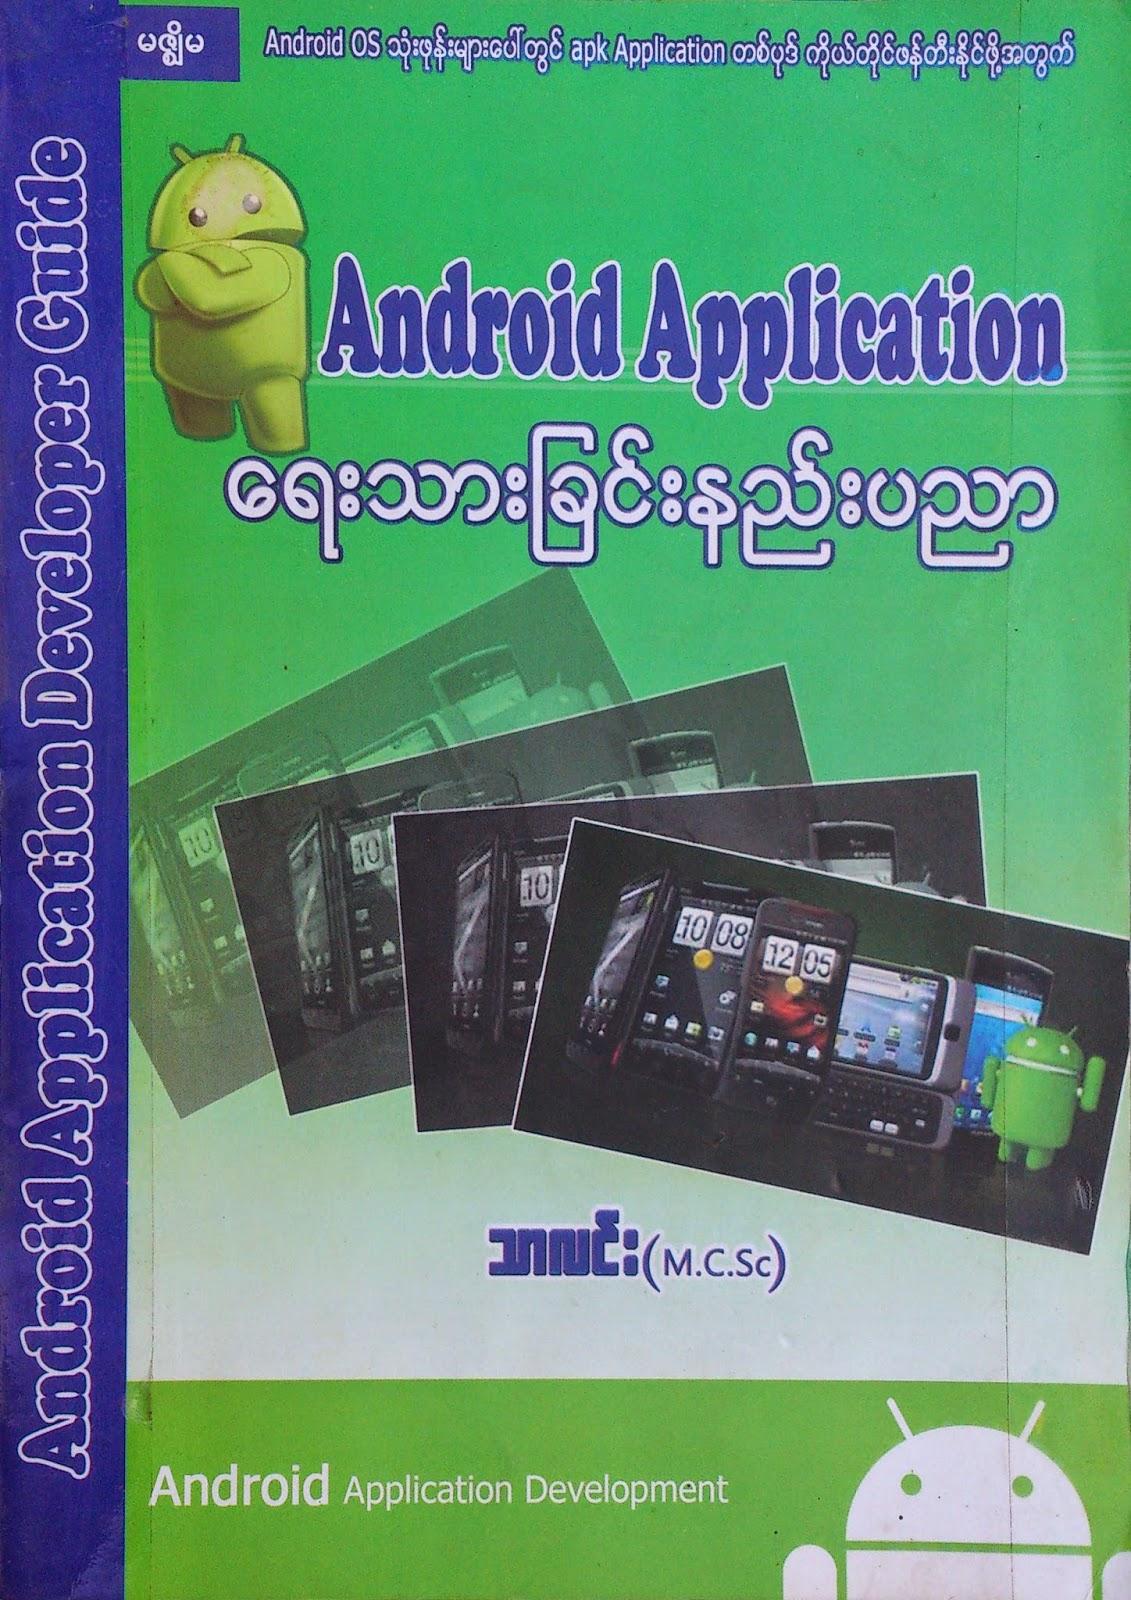 Android Application ေရးသားျခင္းနည္းပညာ